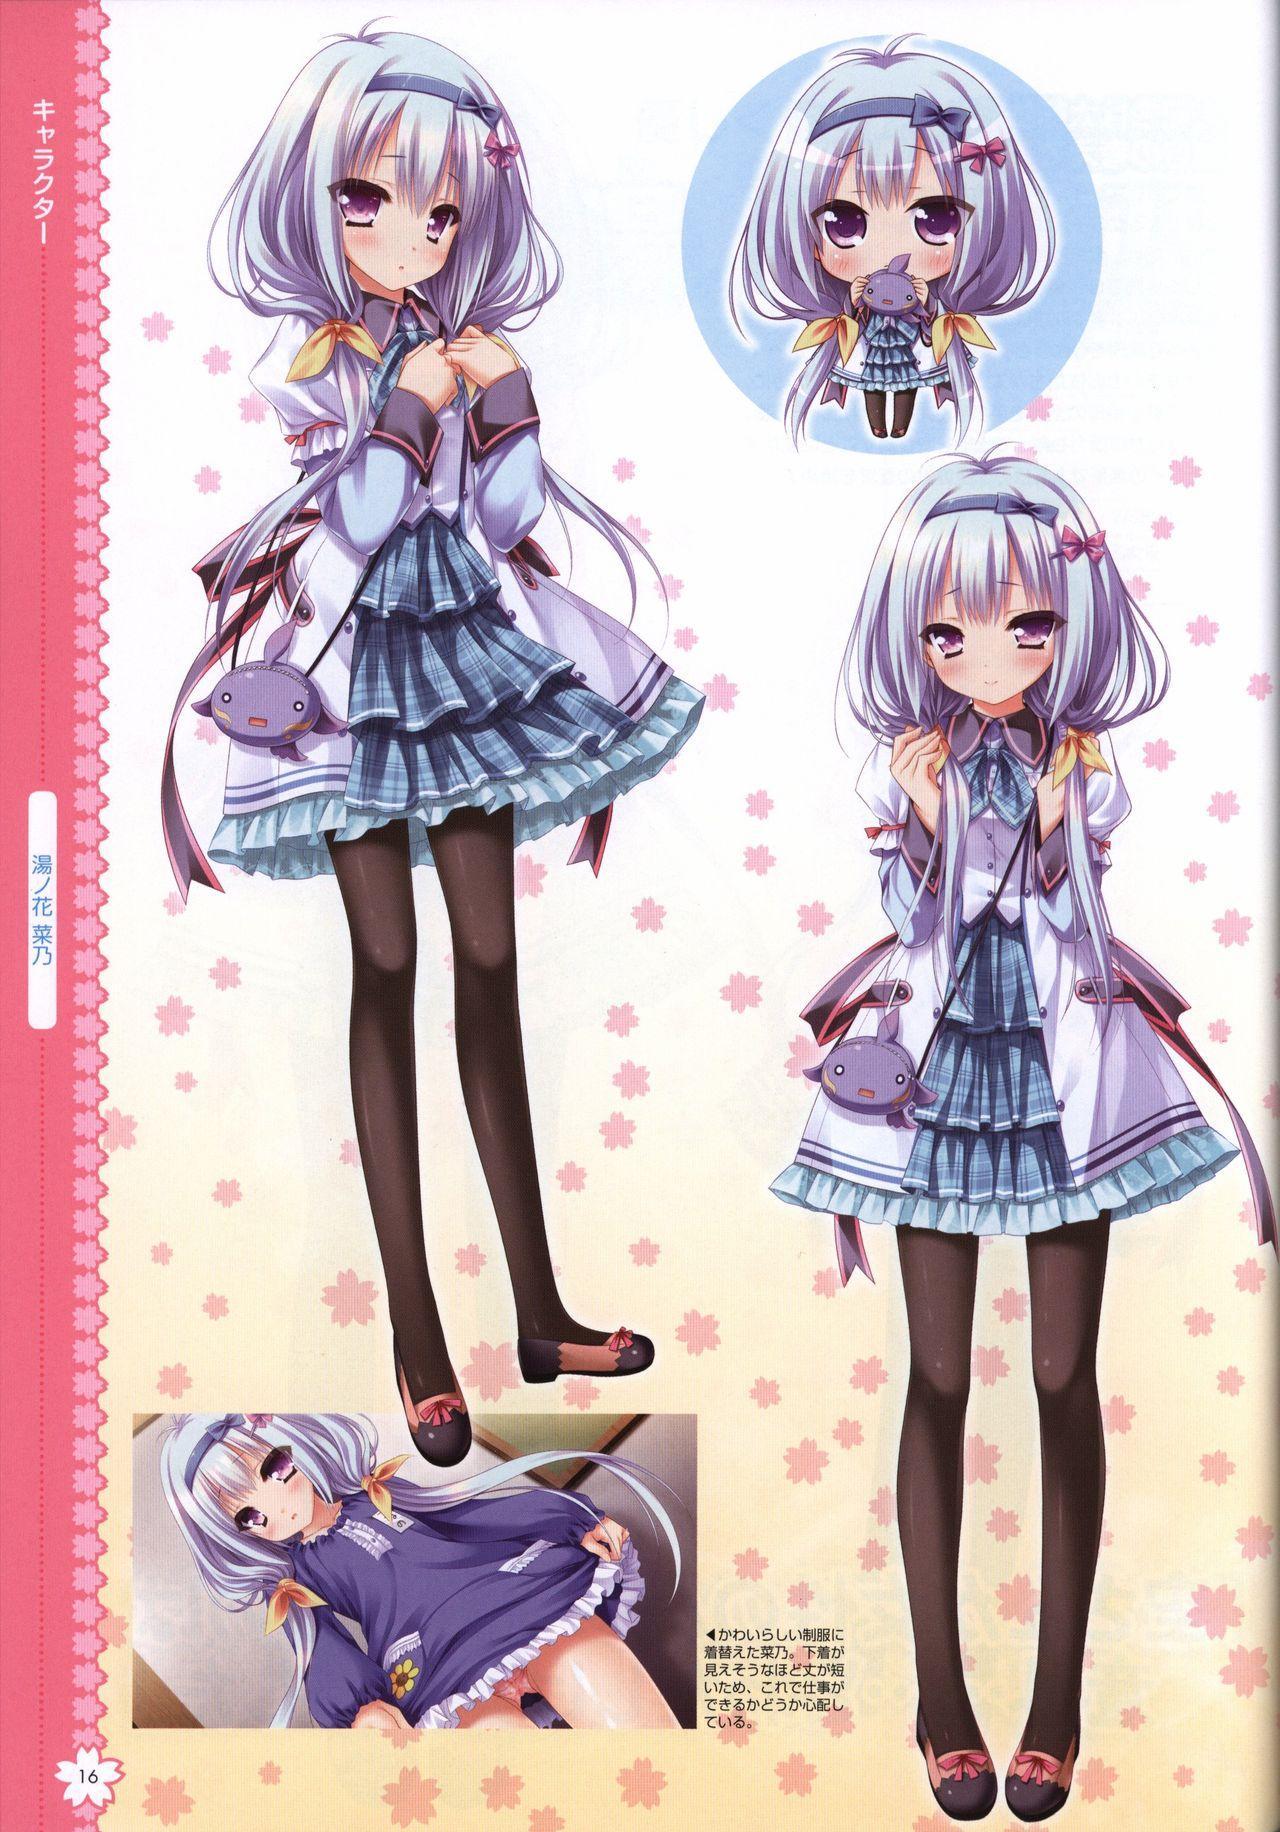 Tayutama2 Visual Art Fanbook 18